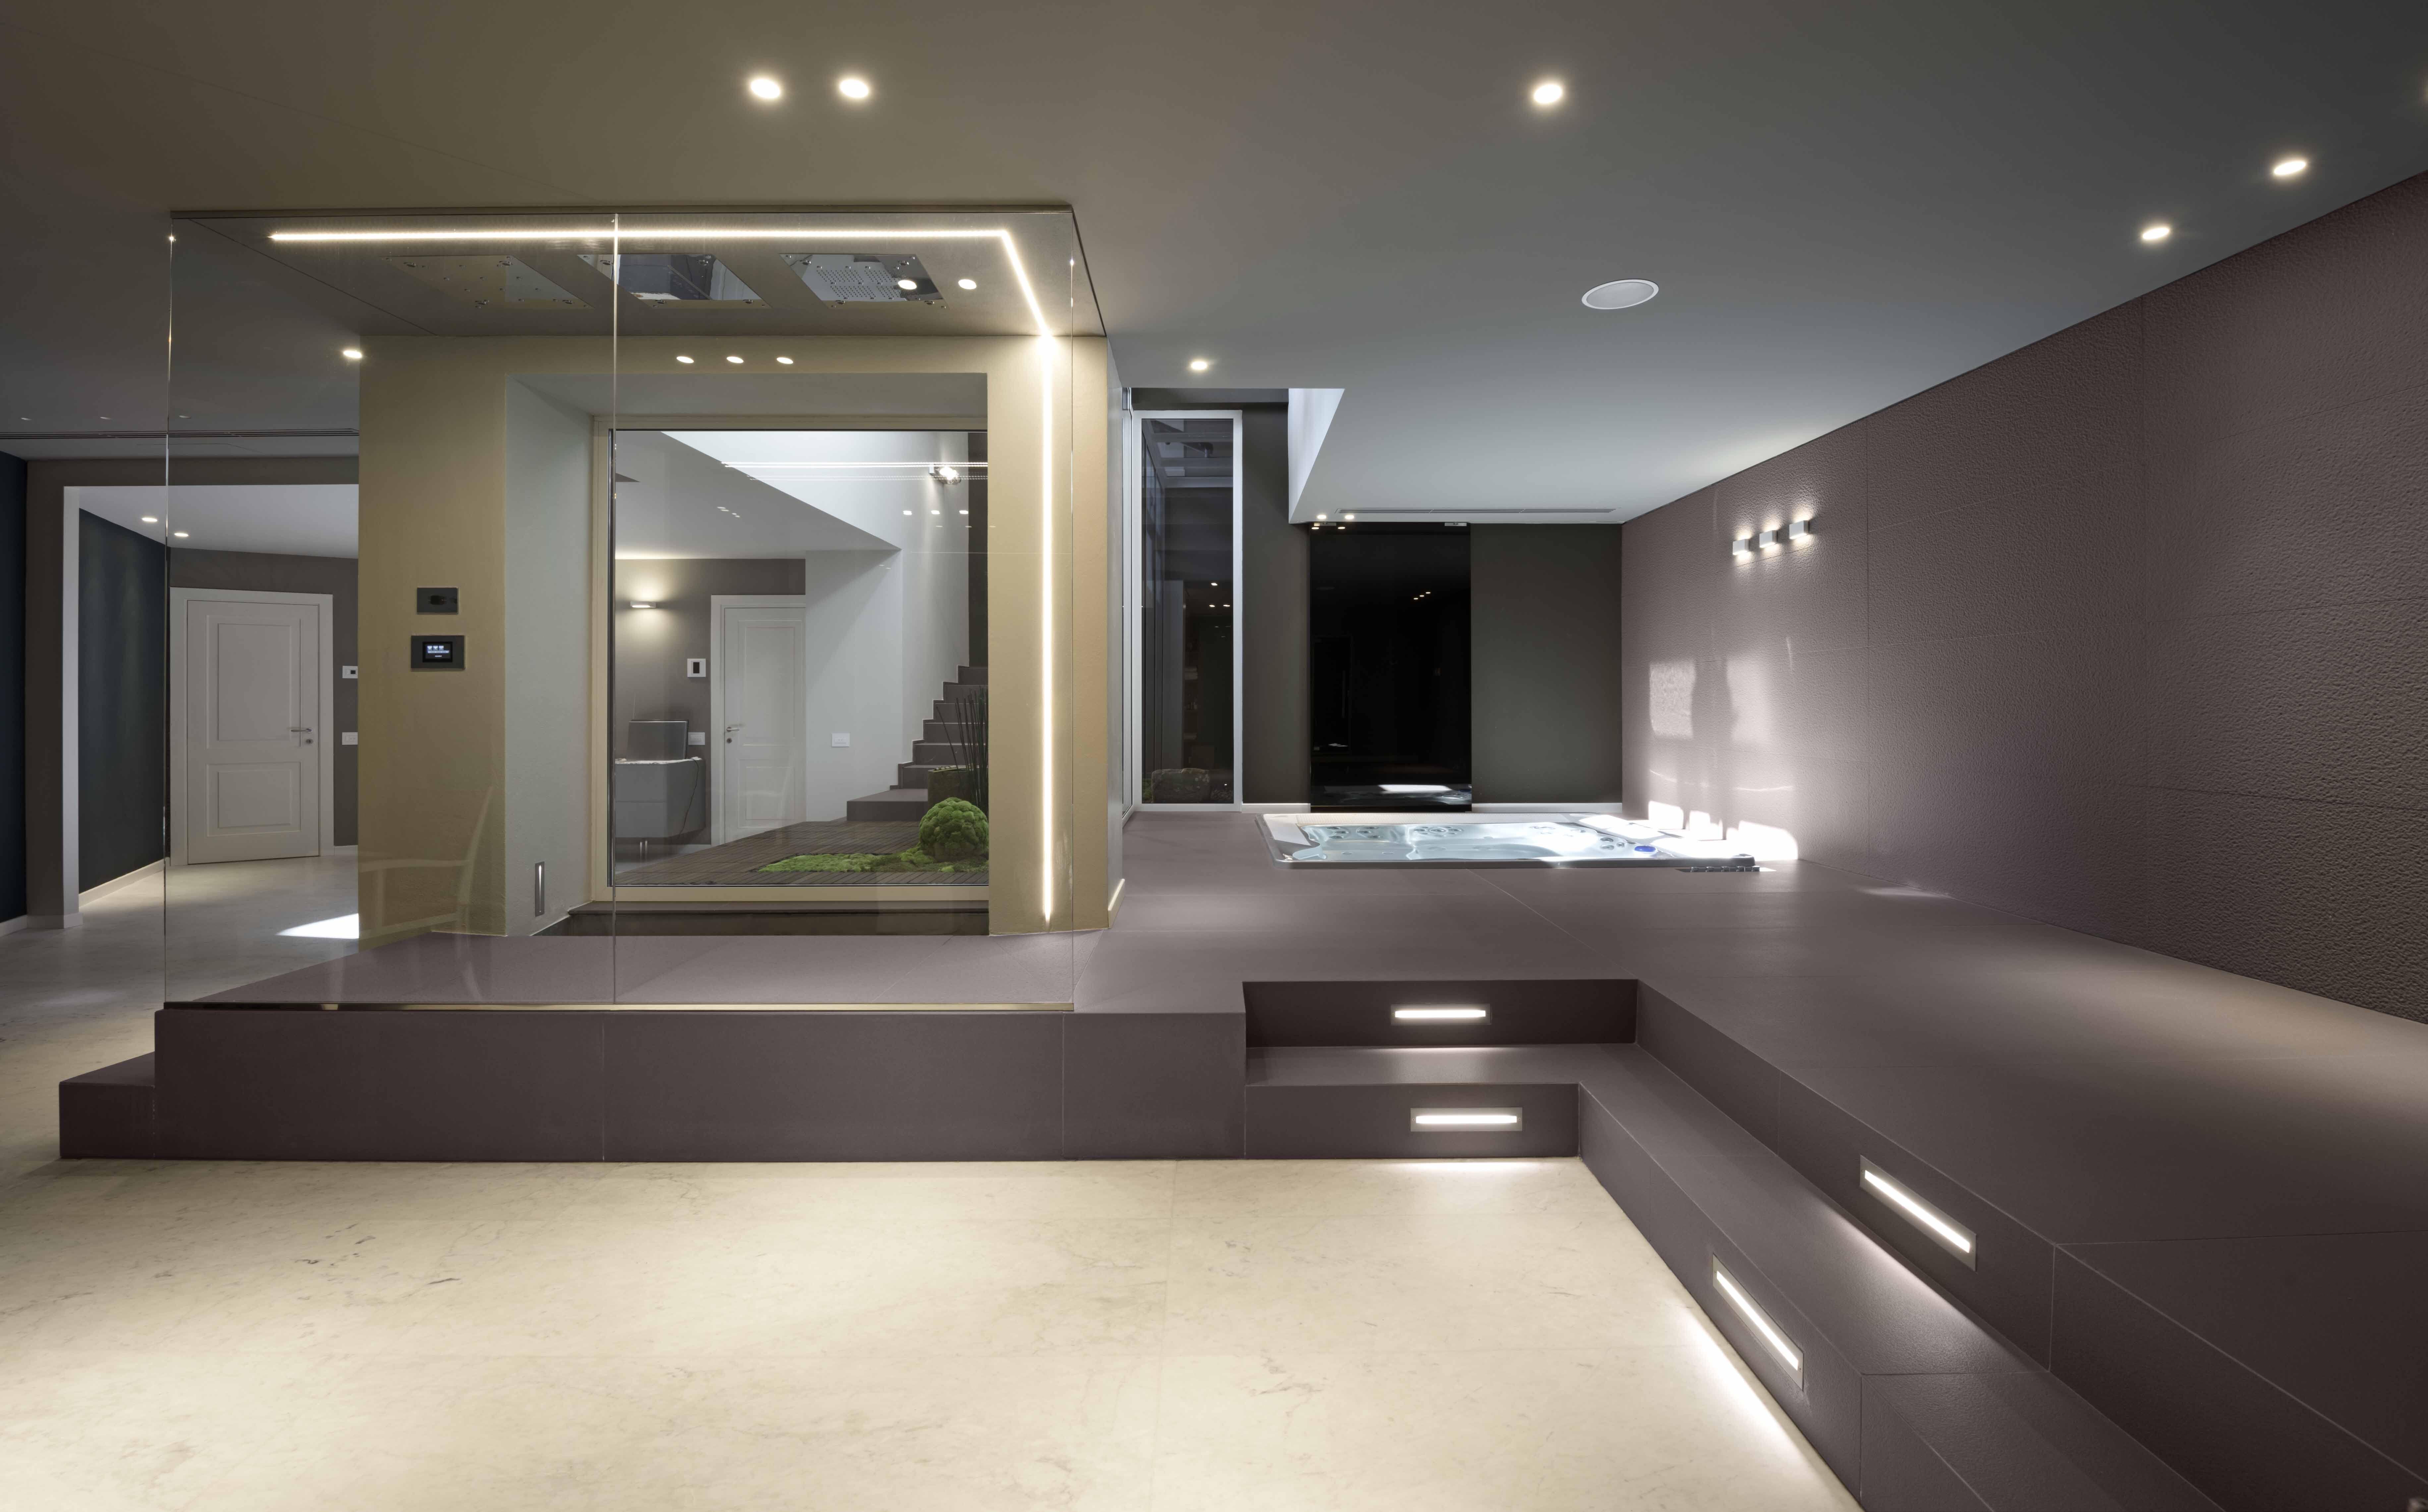 SPA interior wall cladding and flooring